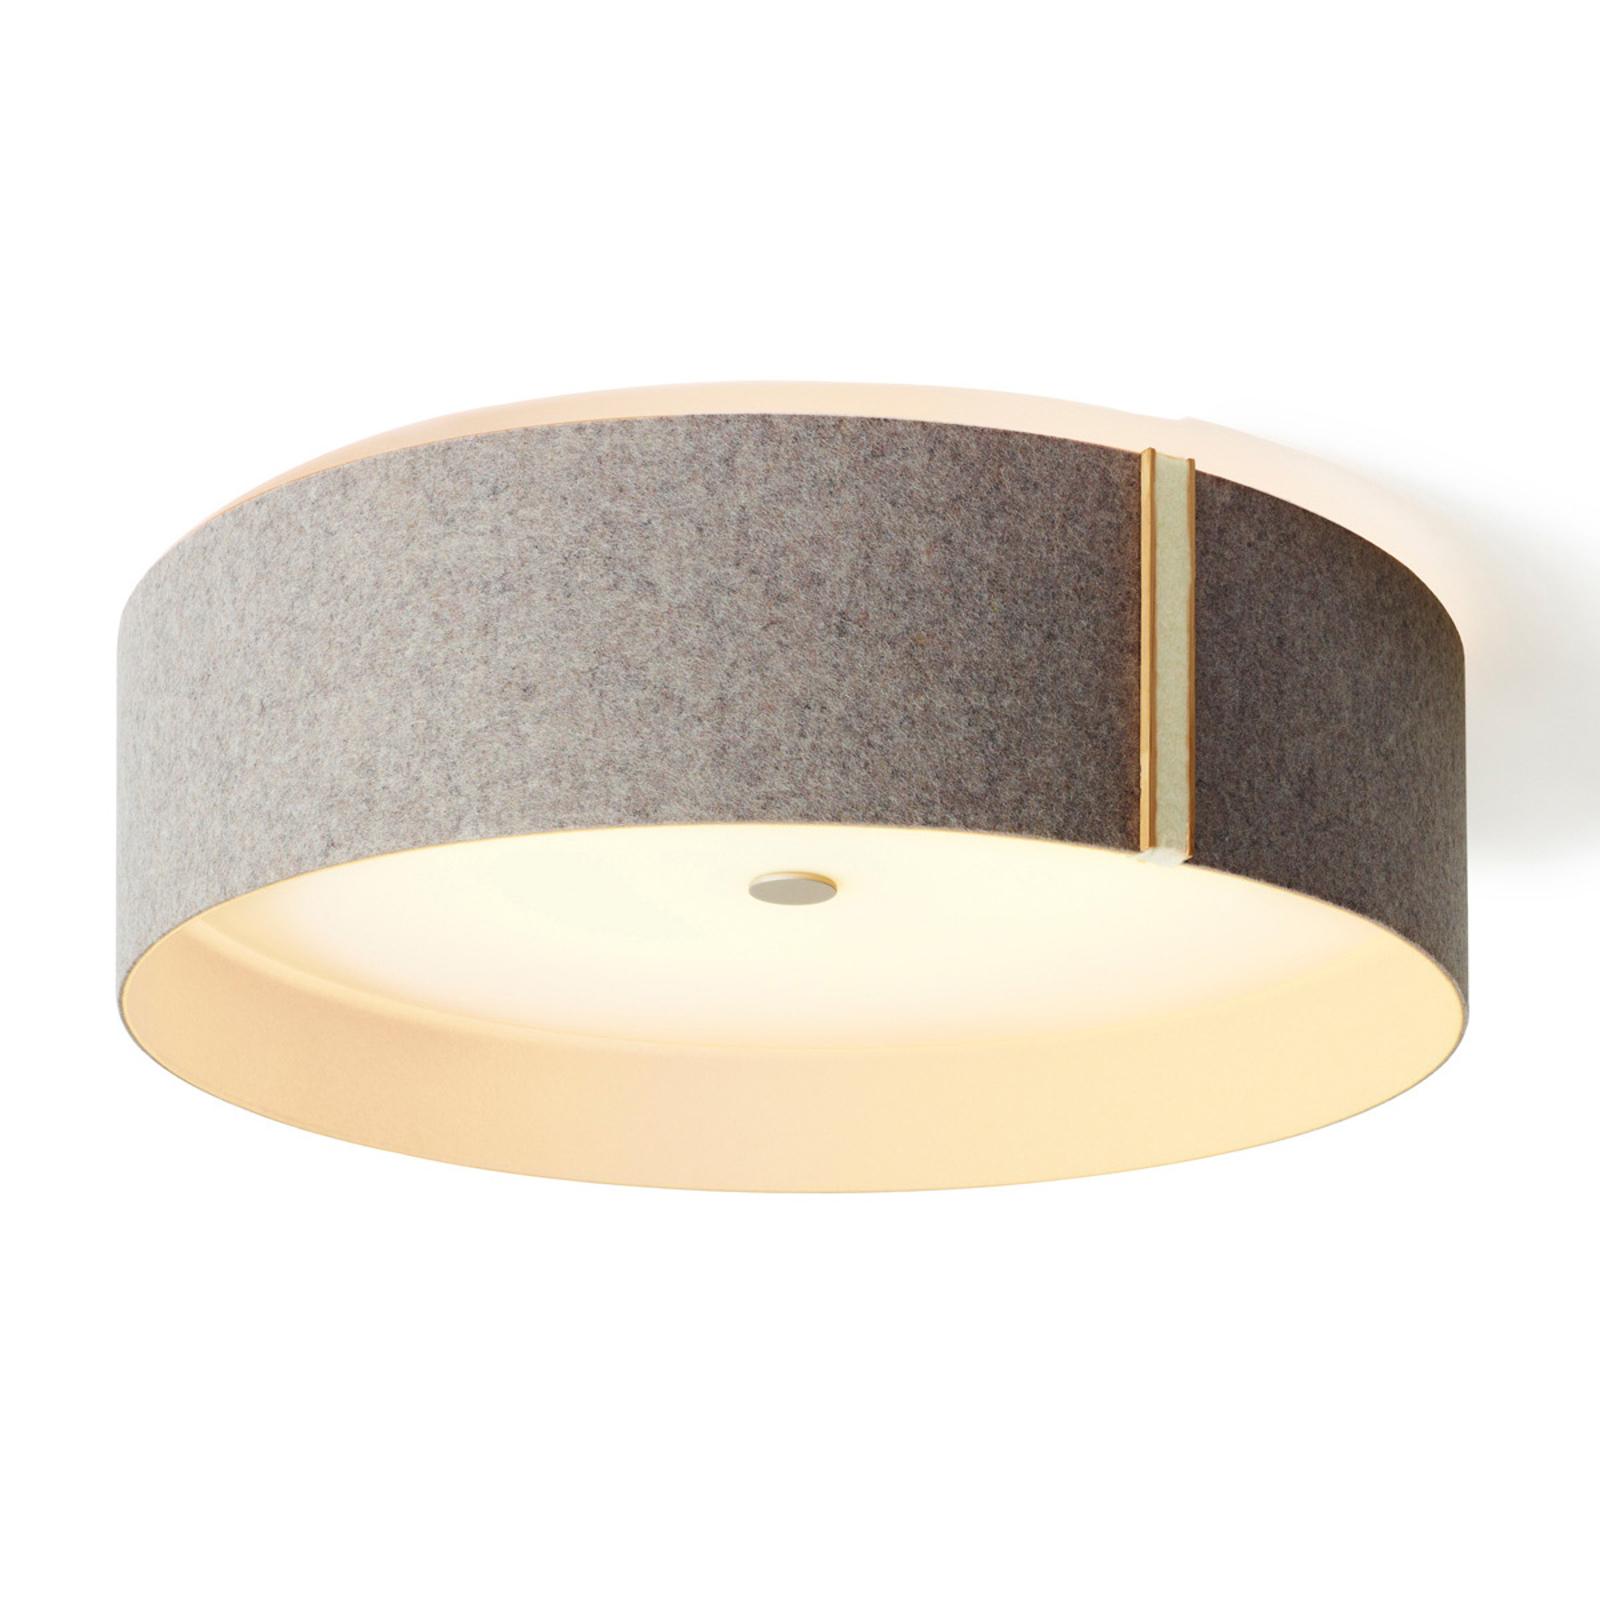 Vilten plafondlamp Lara felt met LED, grijs wolwit